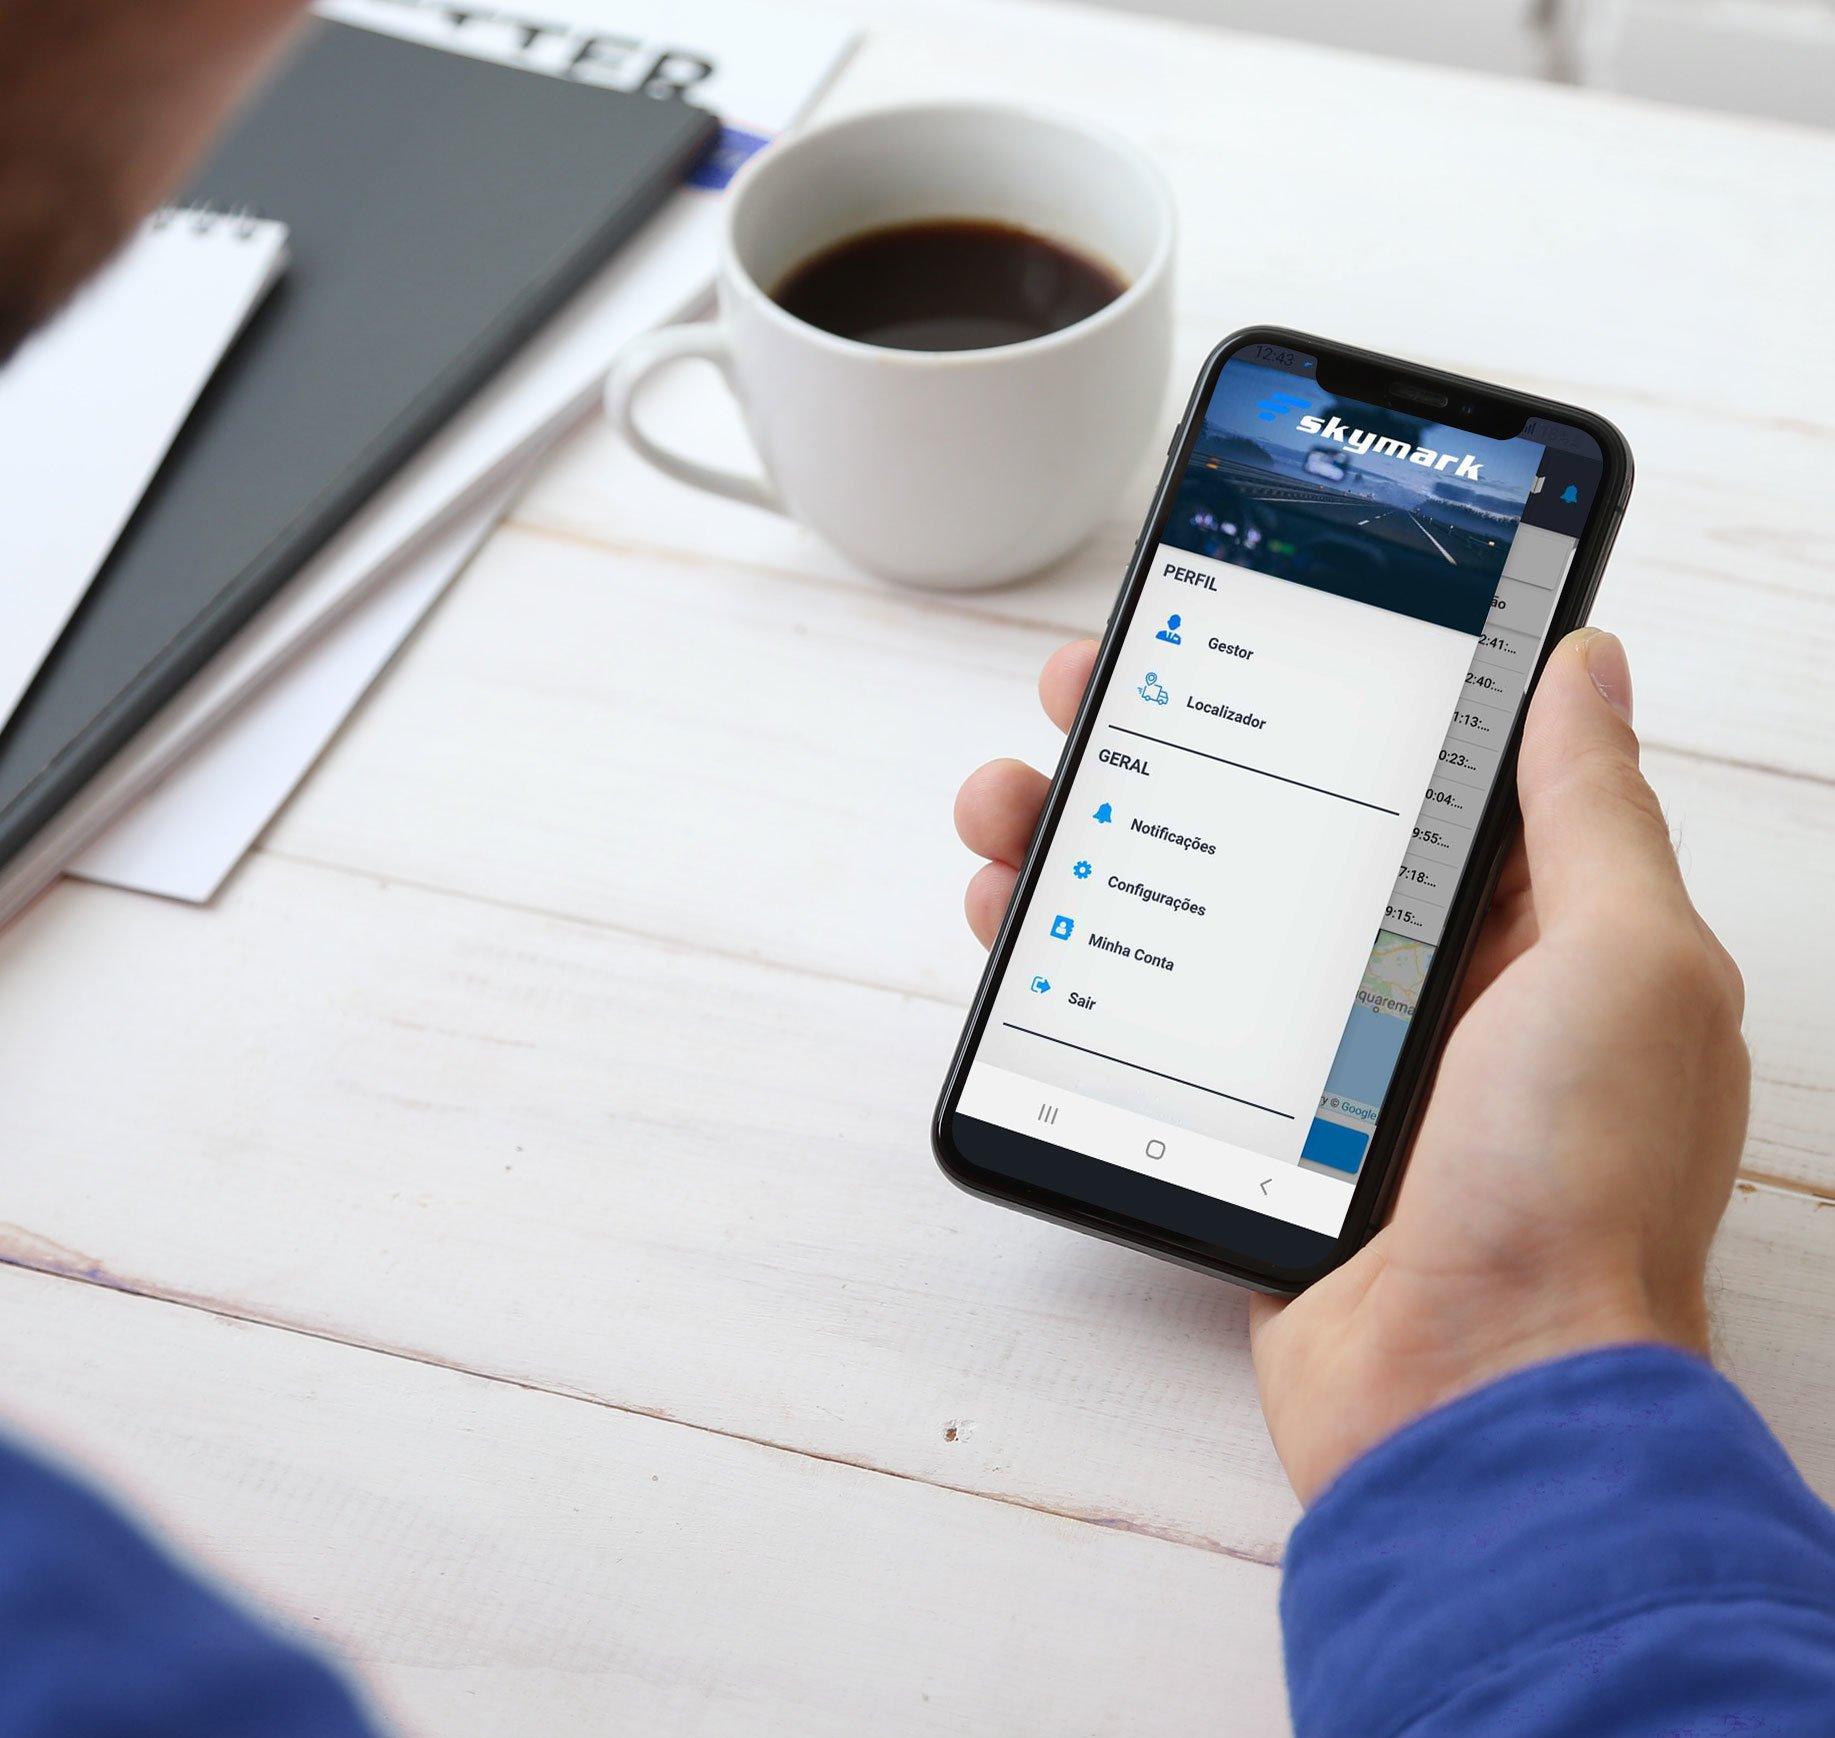 App Jornada do Motorista Skymark